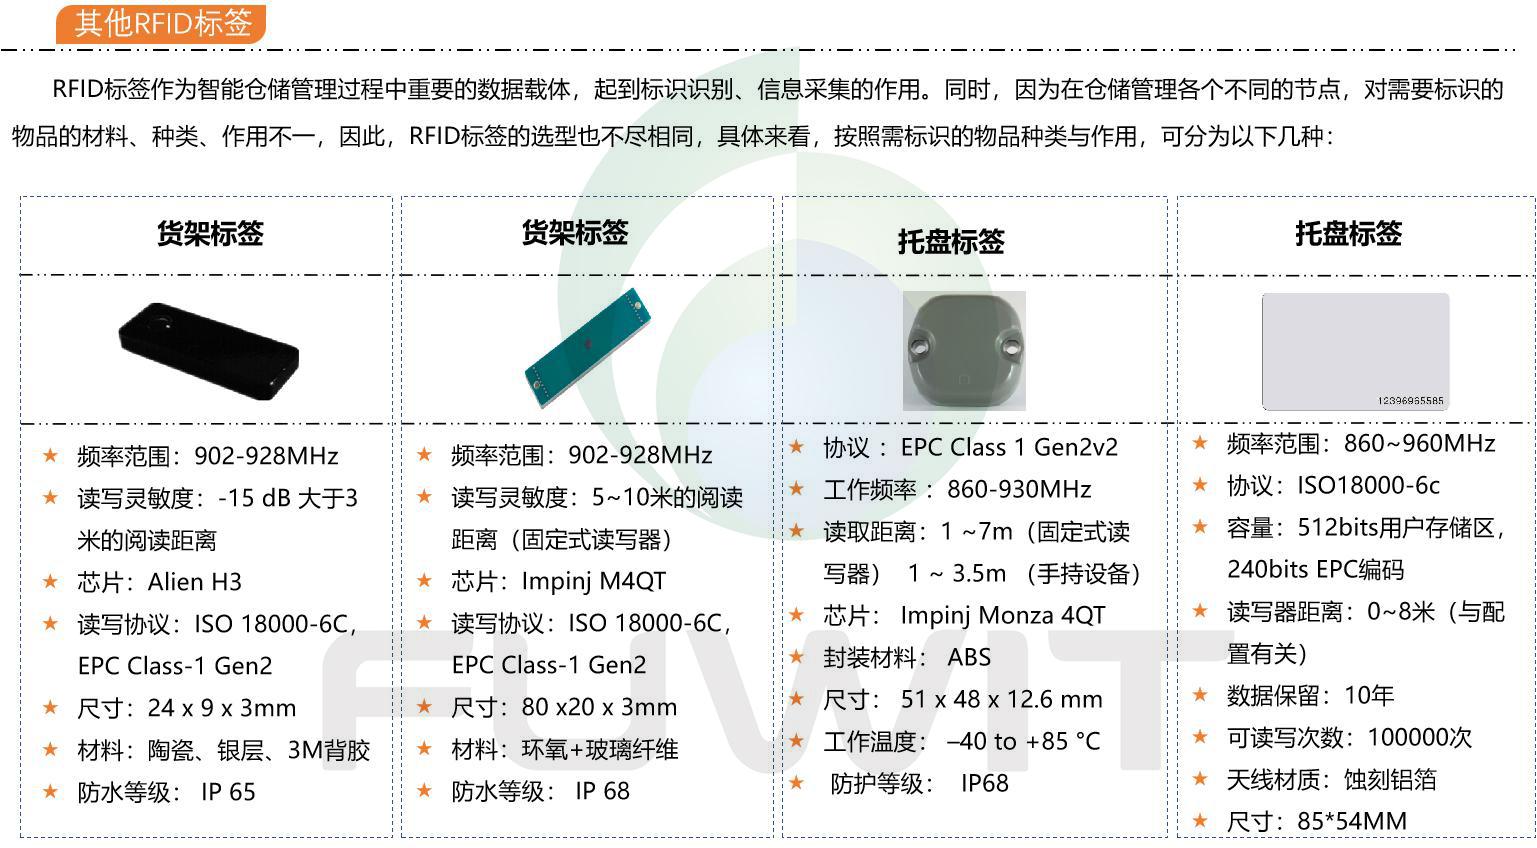 RFID更多产品.jpg